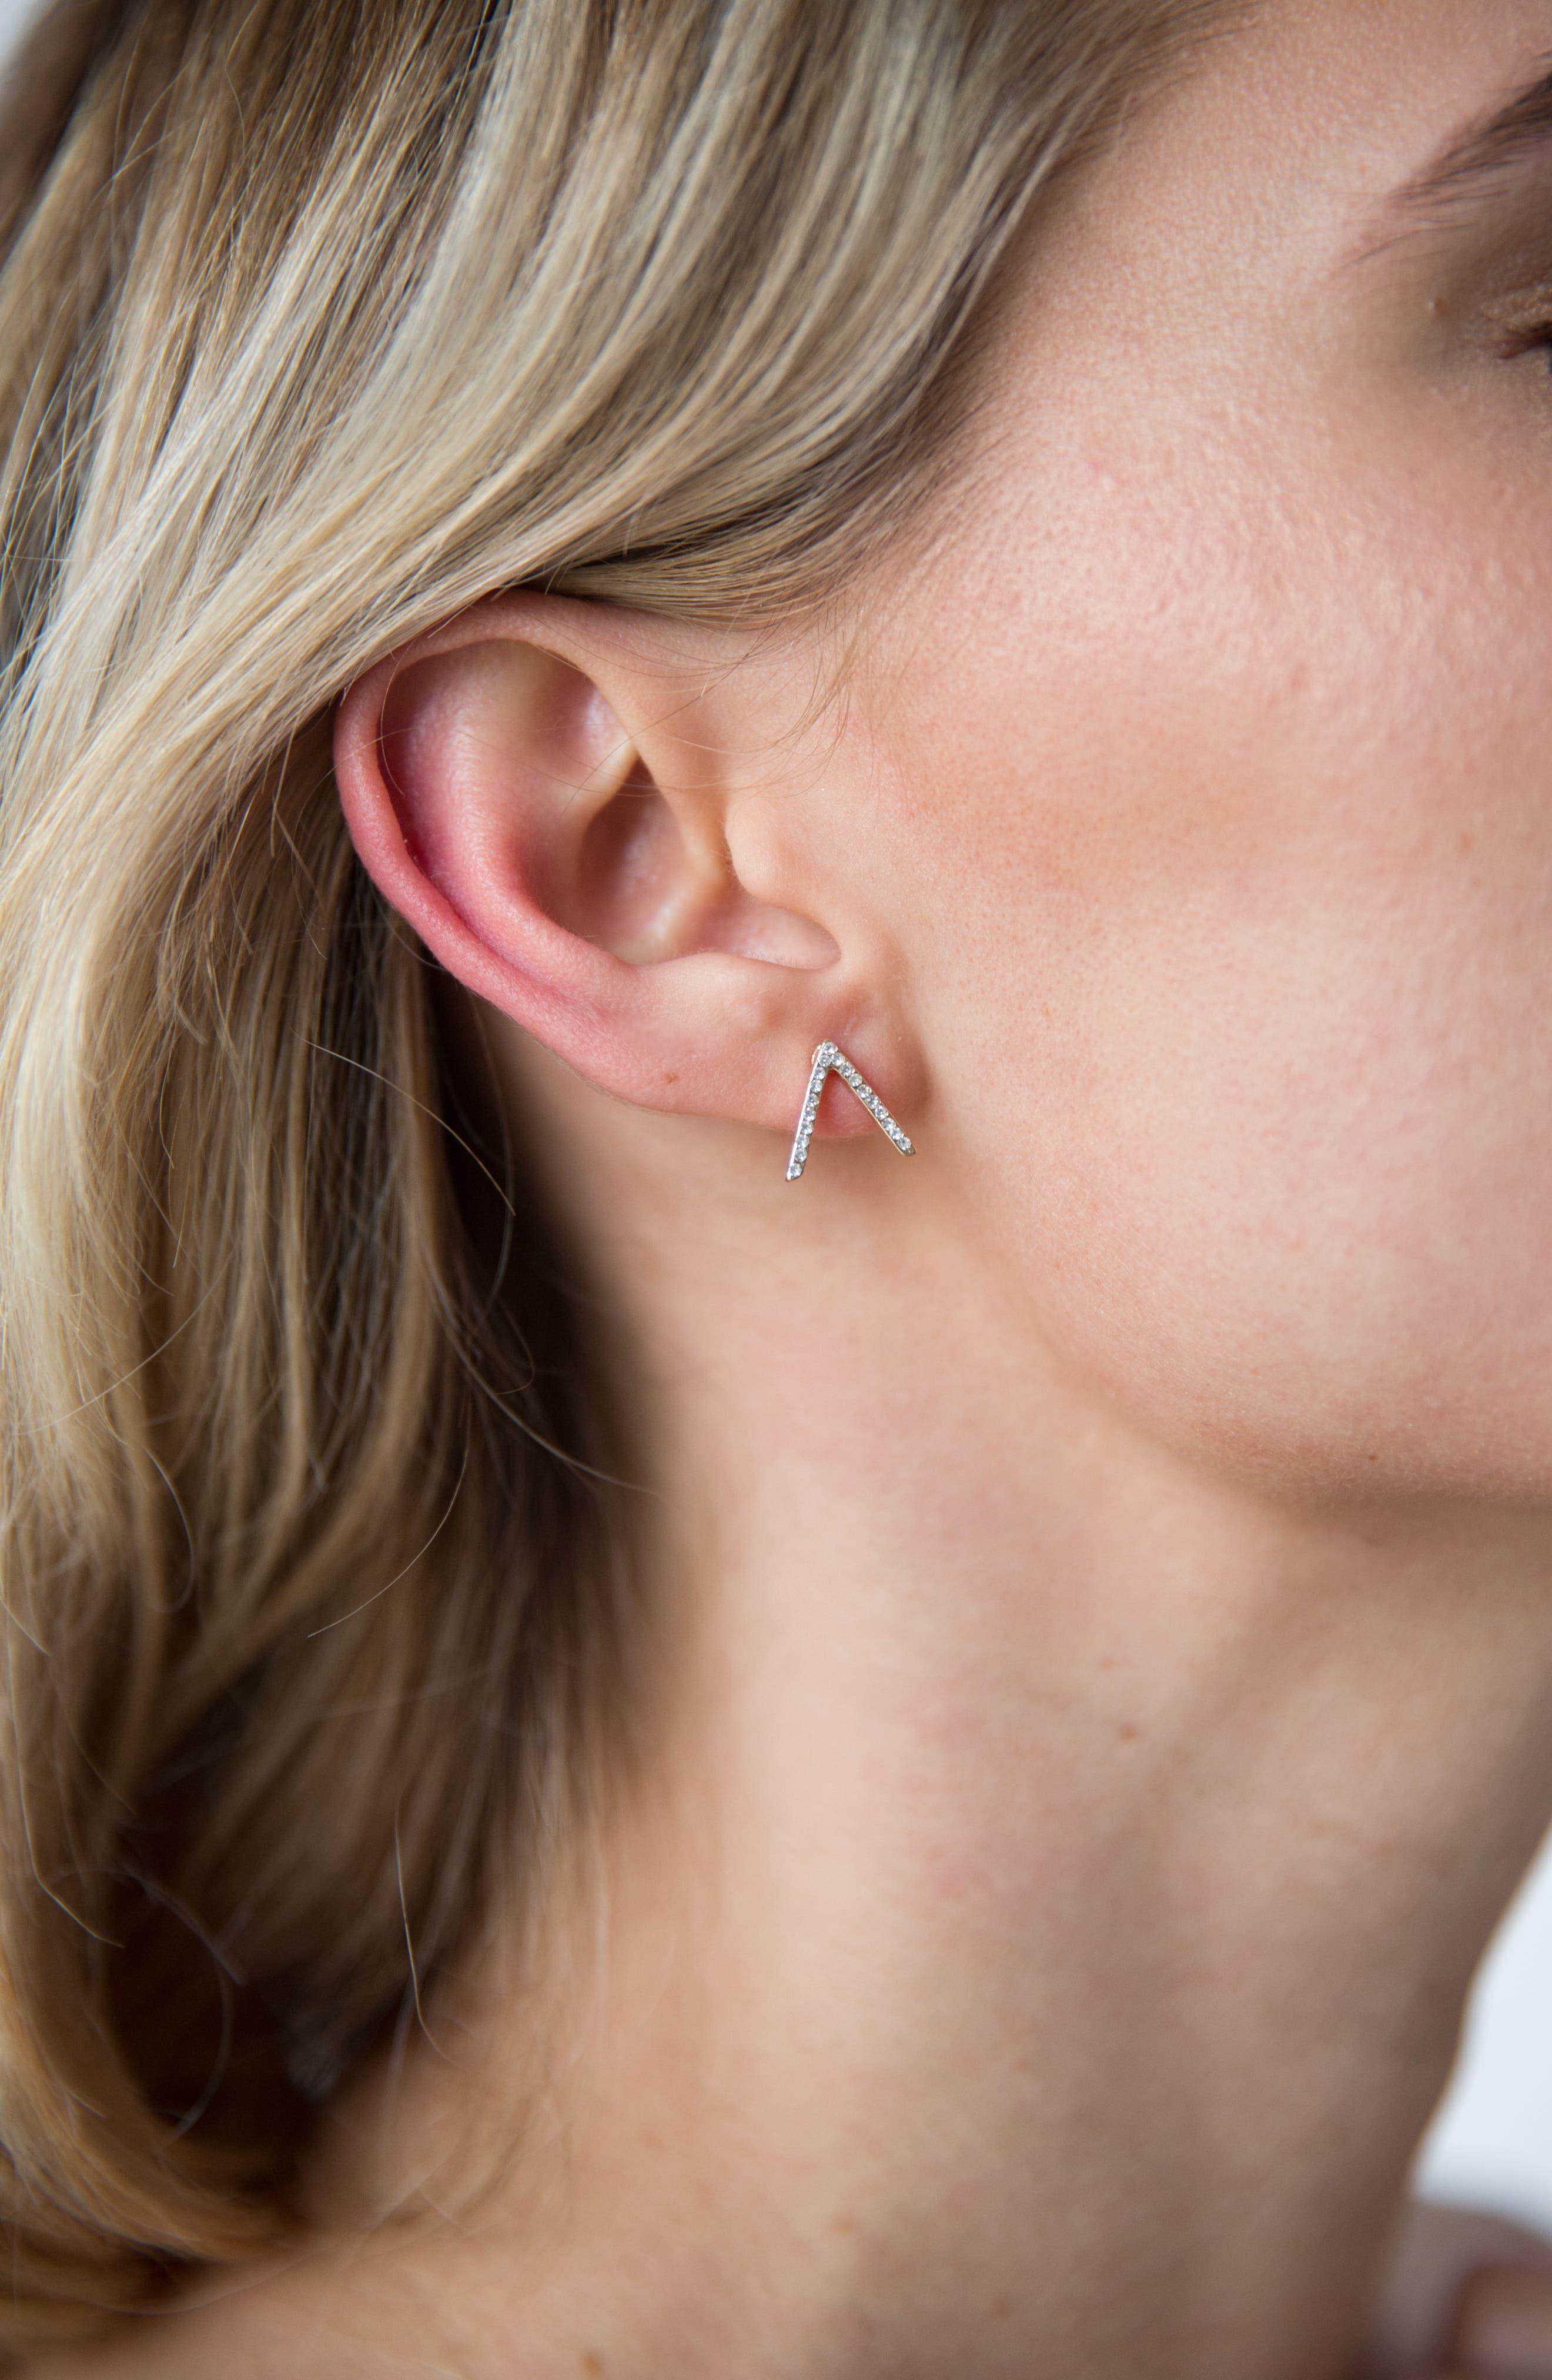 Crystal Chevron Stud Earrings,                             Alternate thumbnail 3, color,